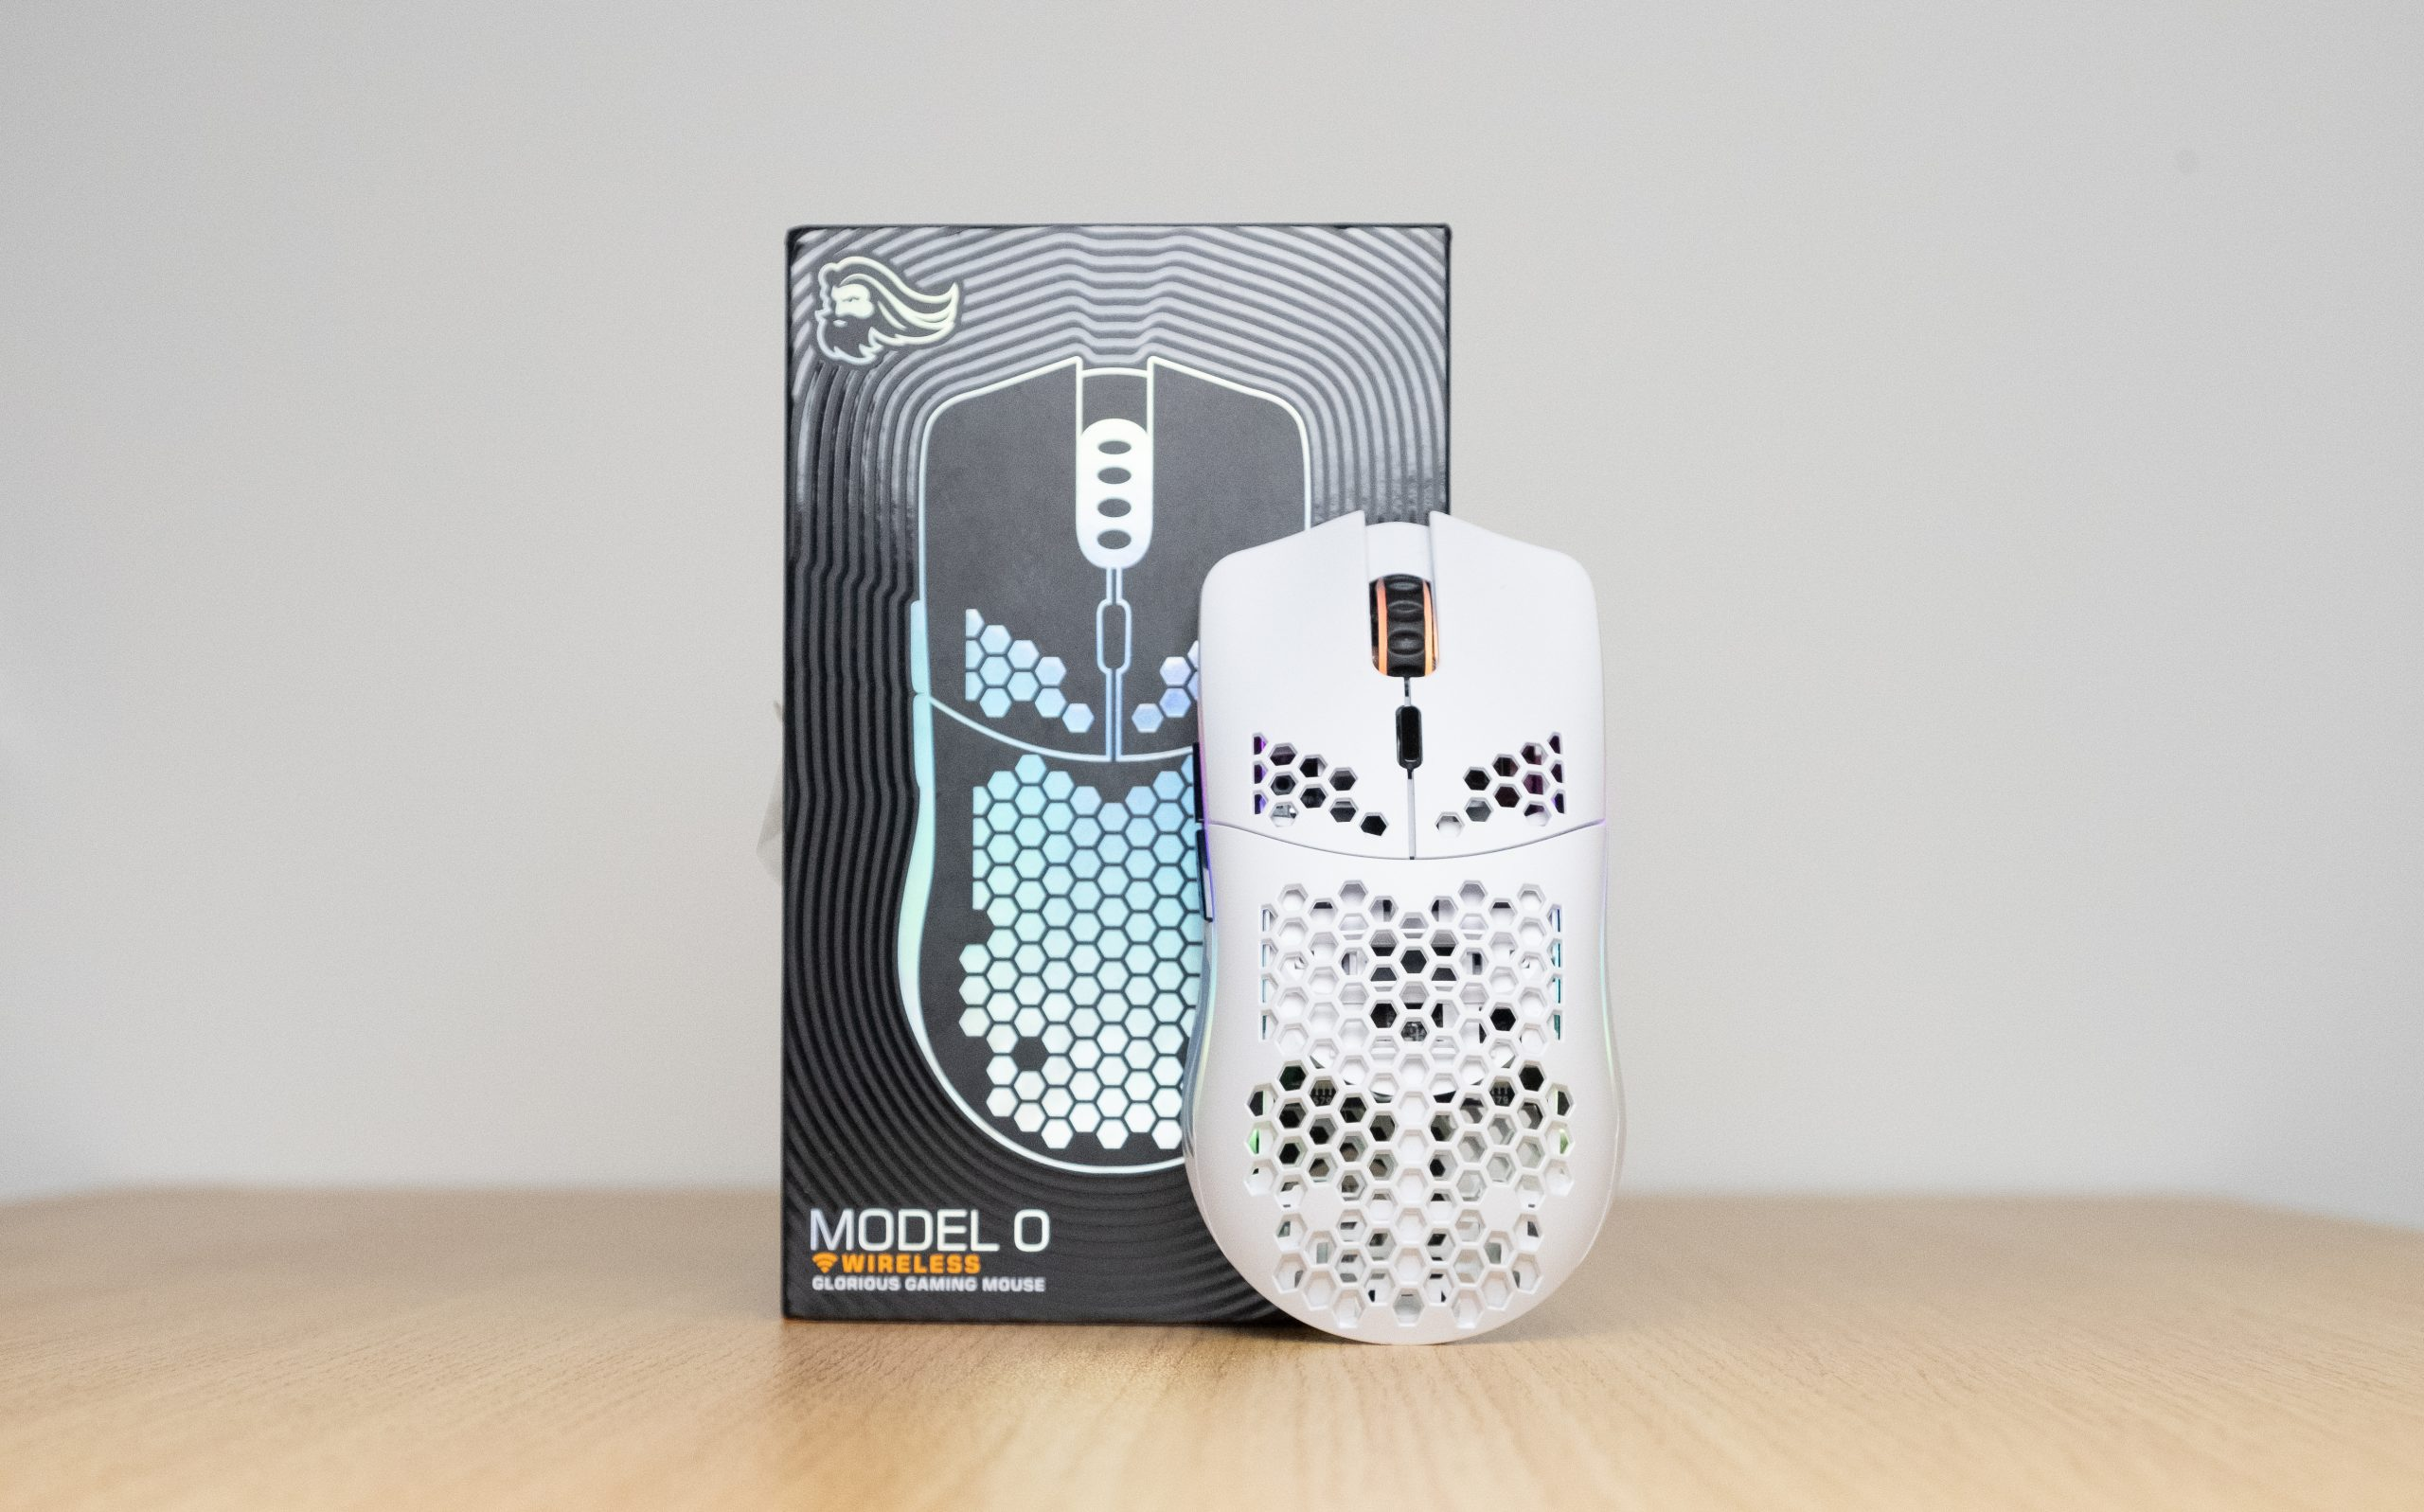 Glorious Model O Wireless - Box